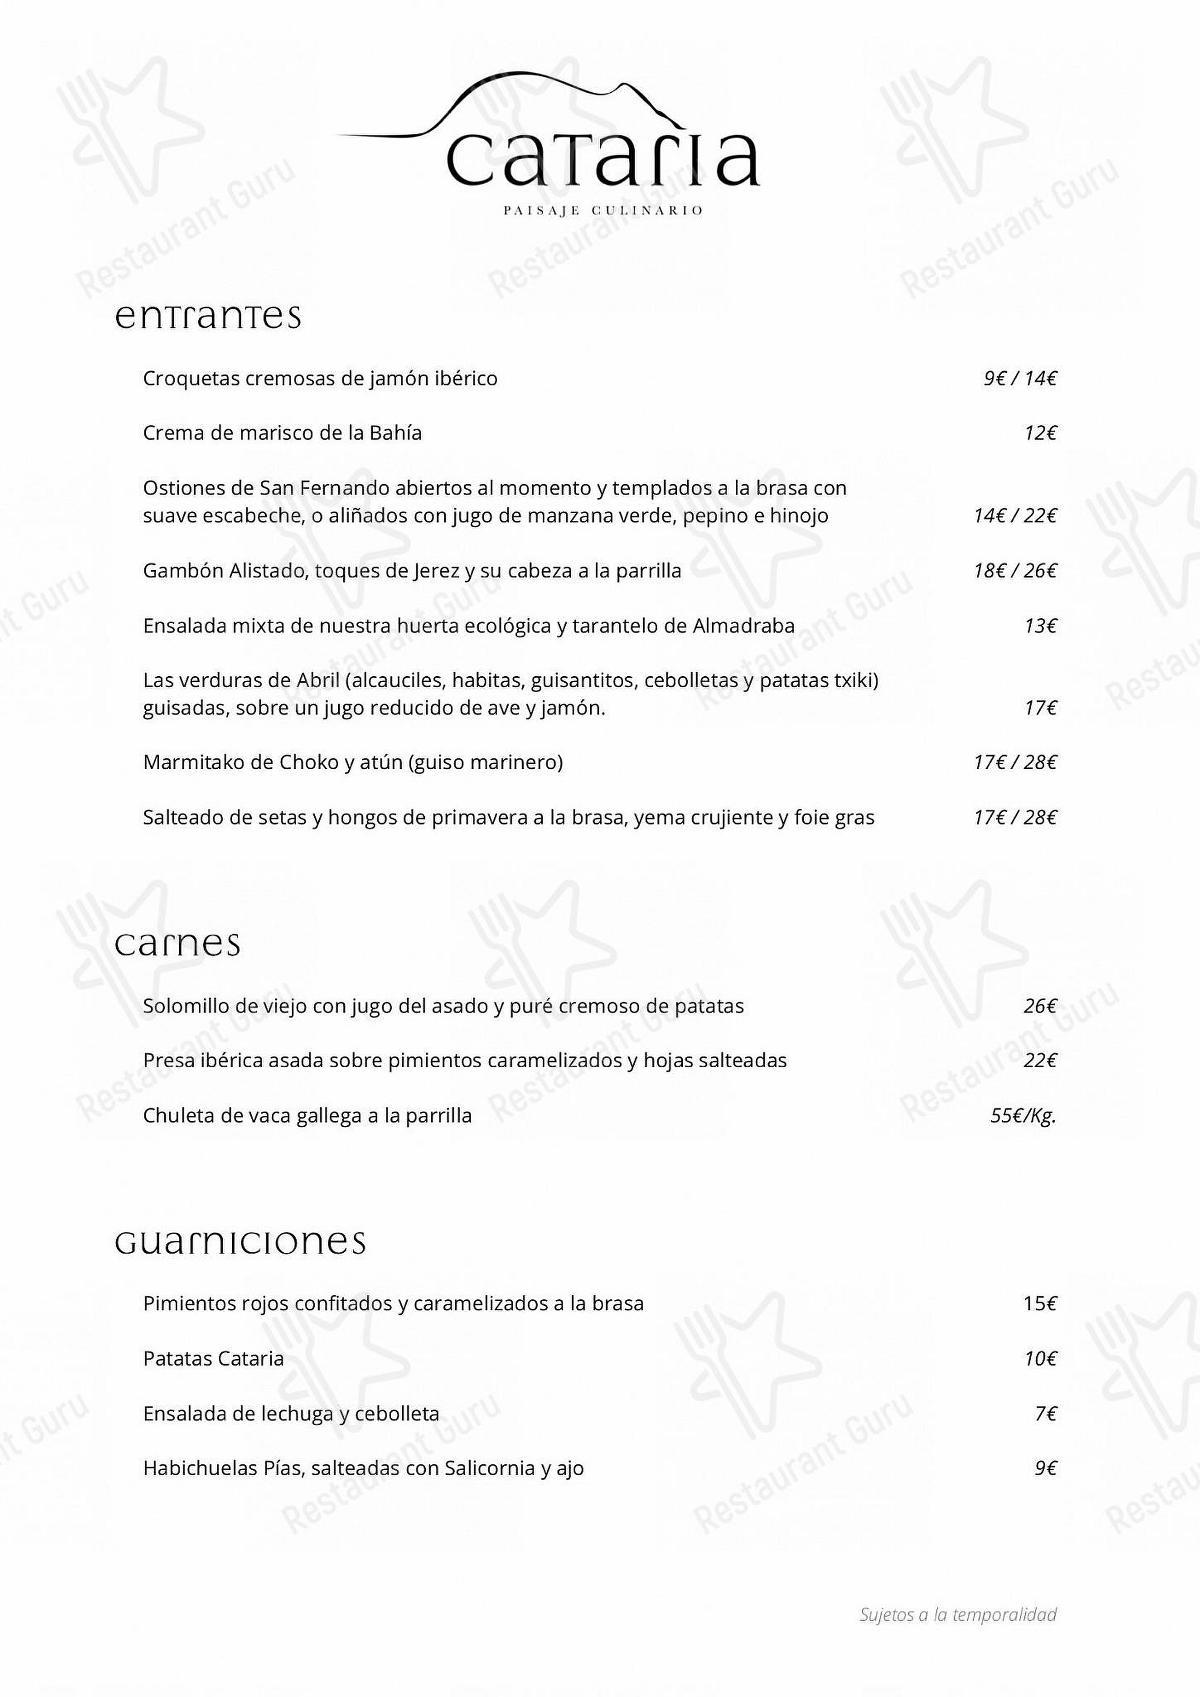 Mira la carta de Restaurante Cataria